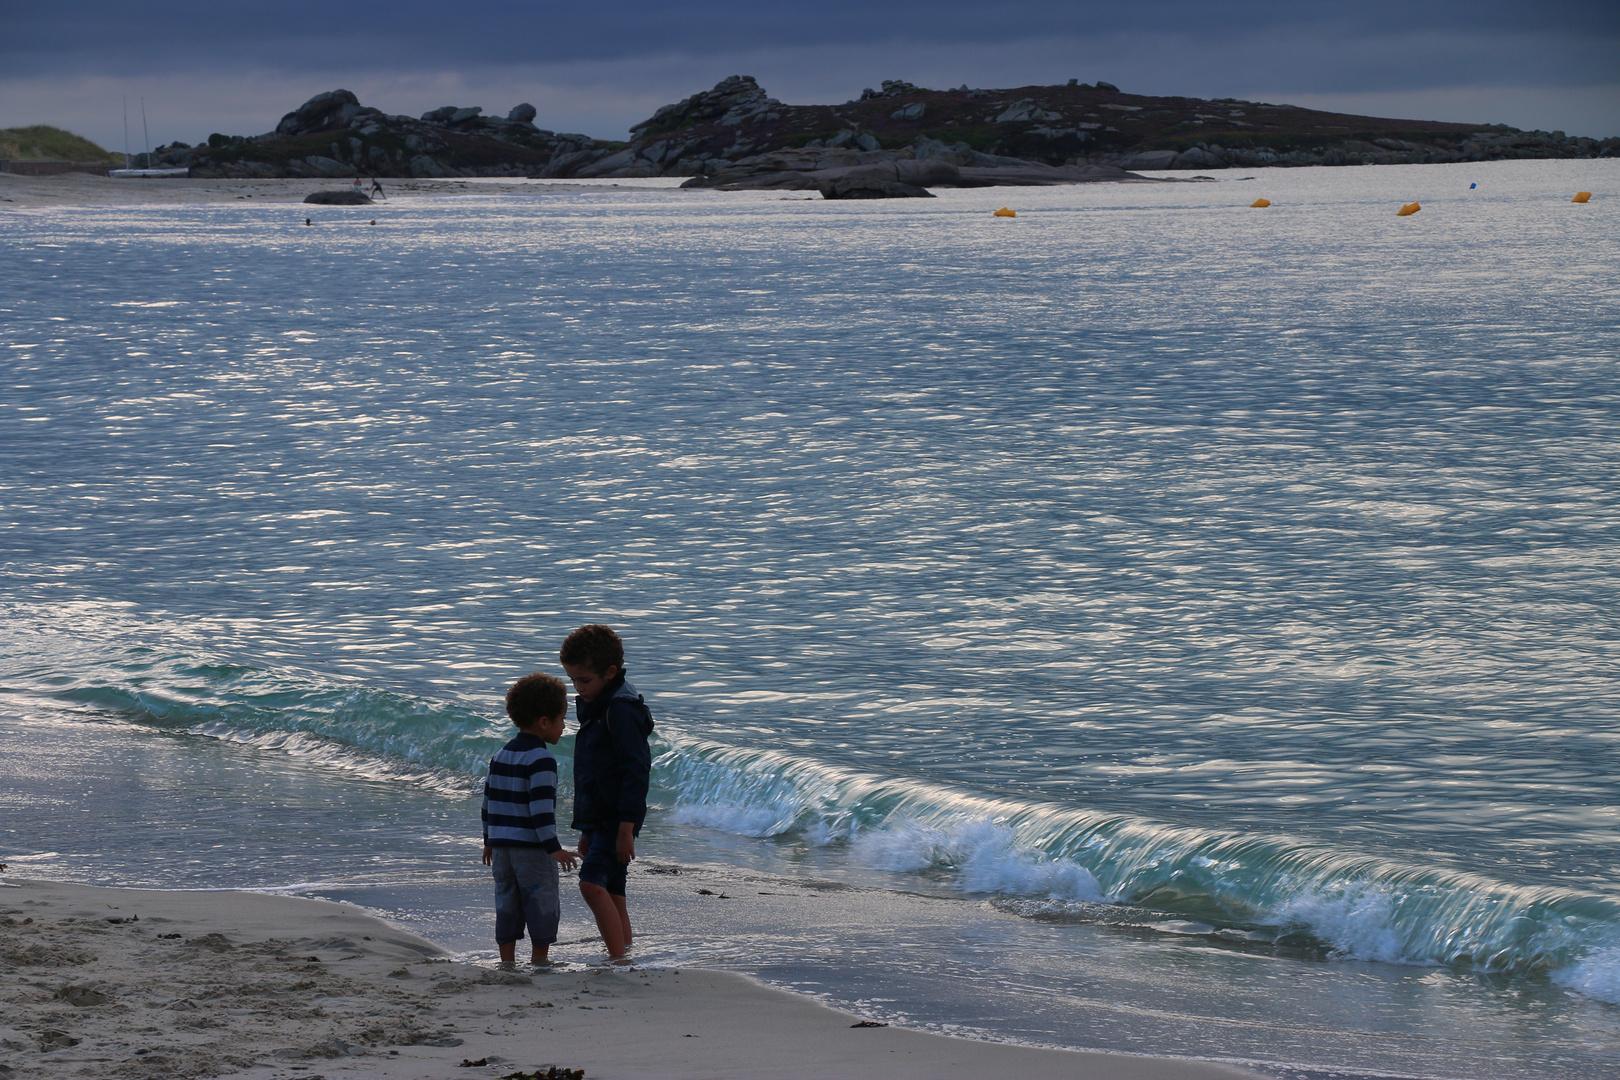 Am Meer in der Normandie